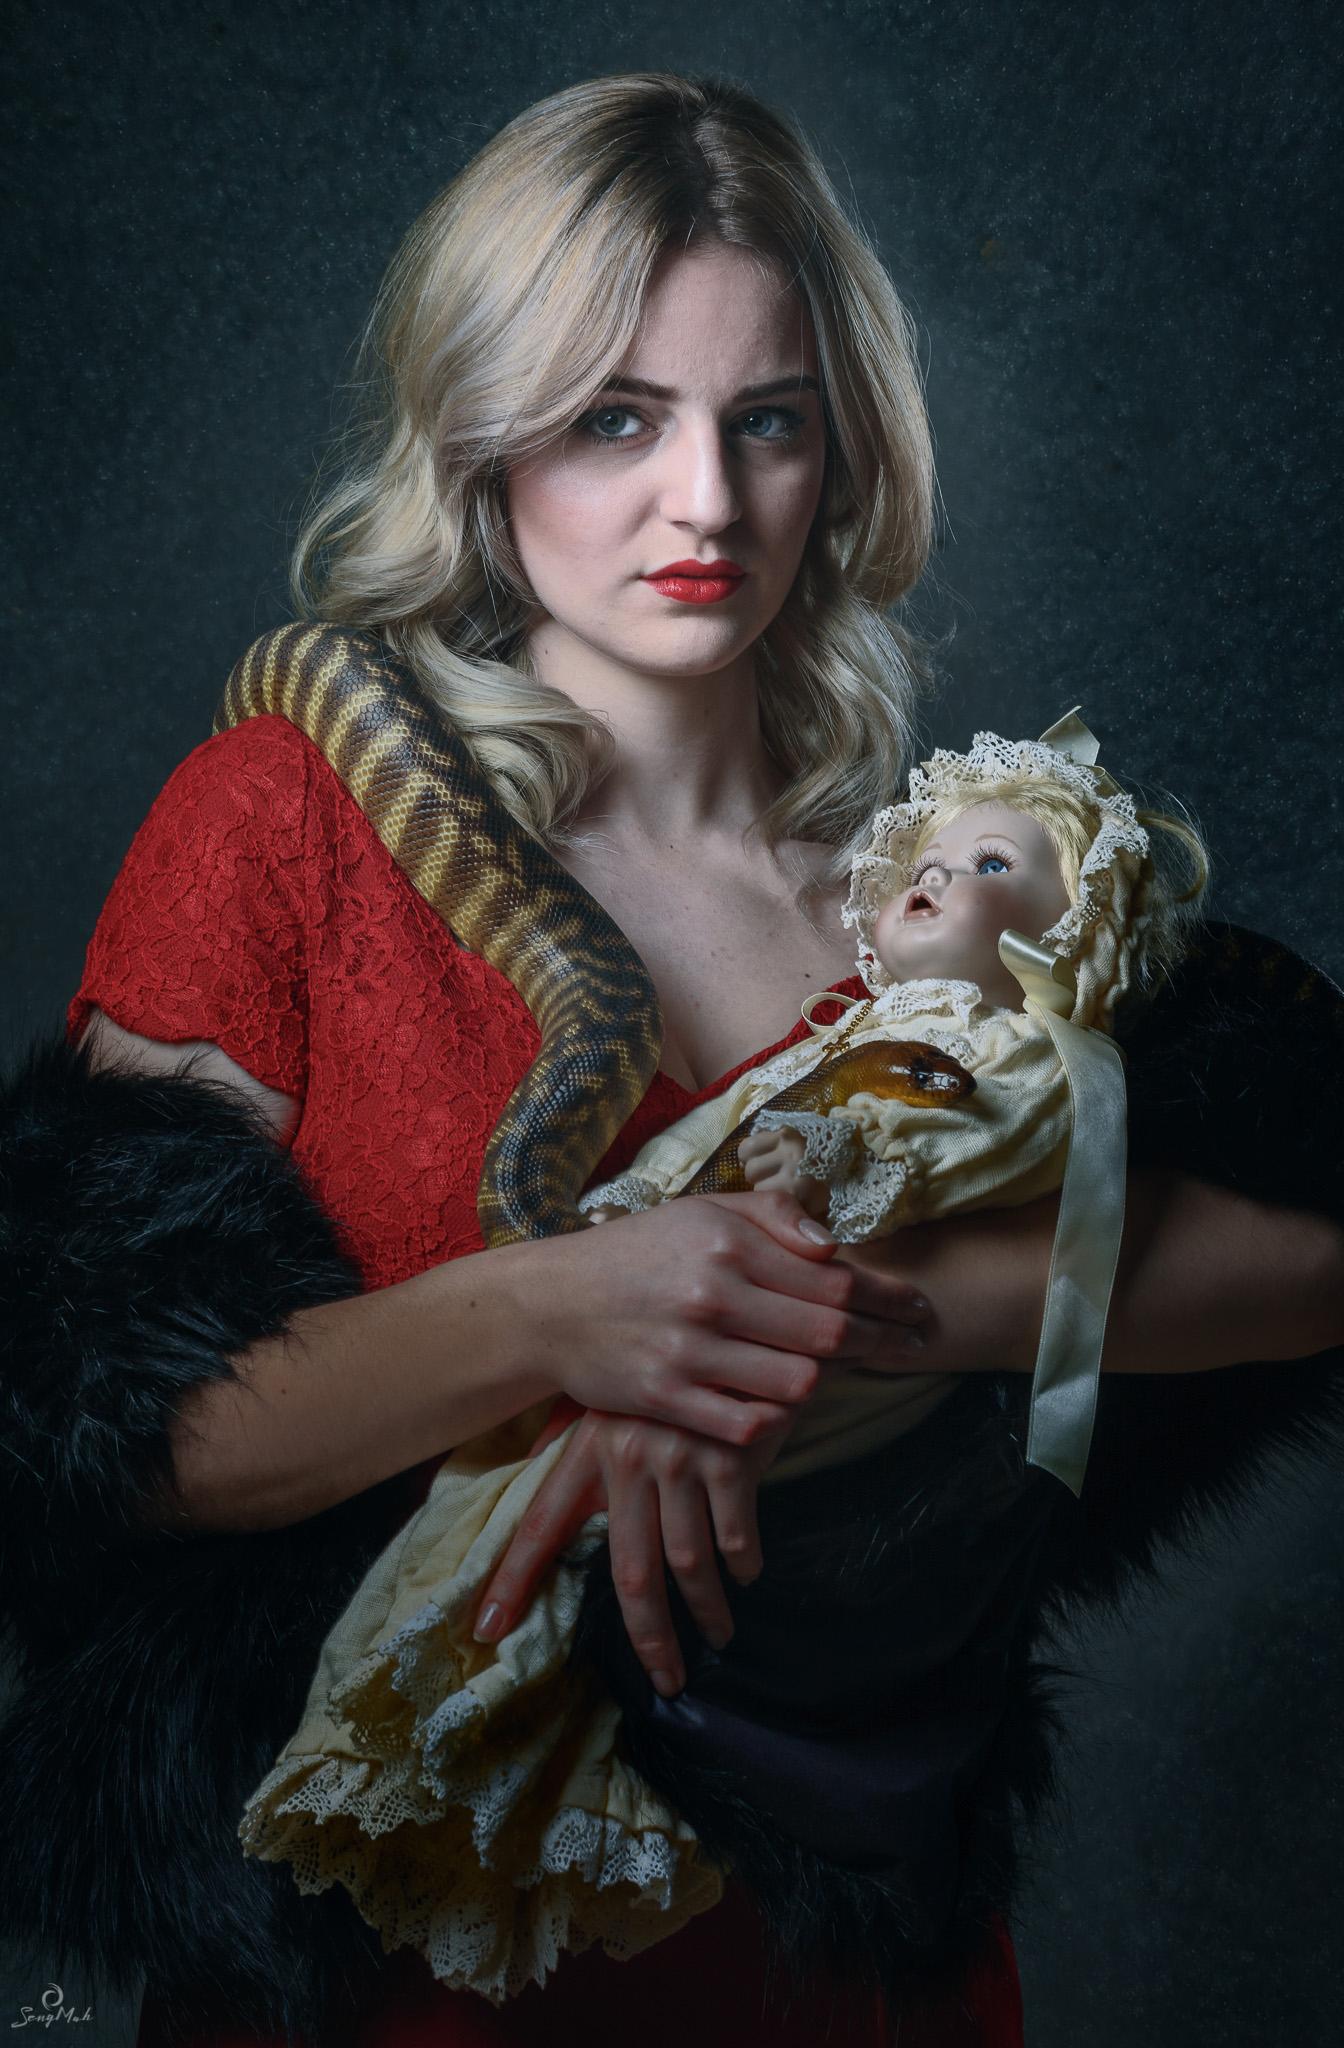 The strange mother